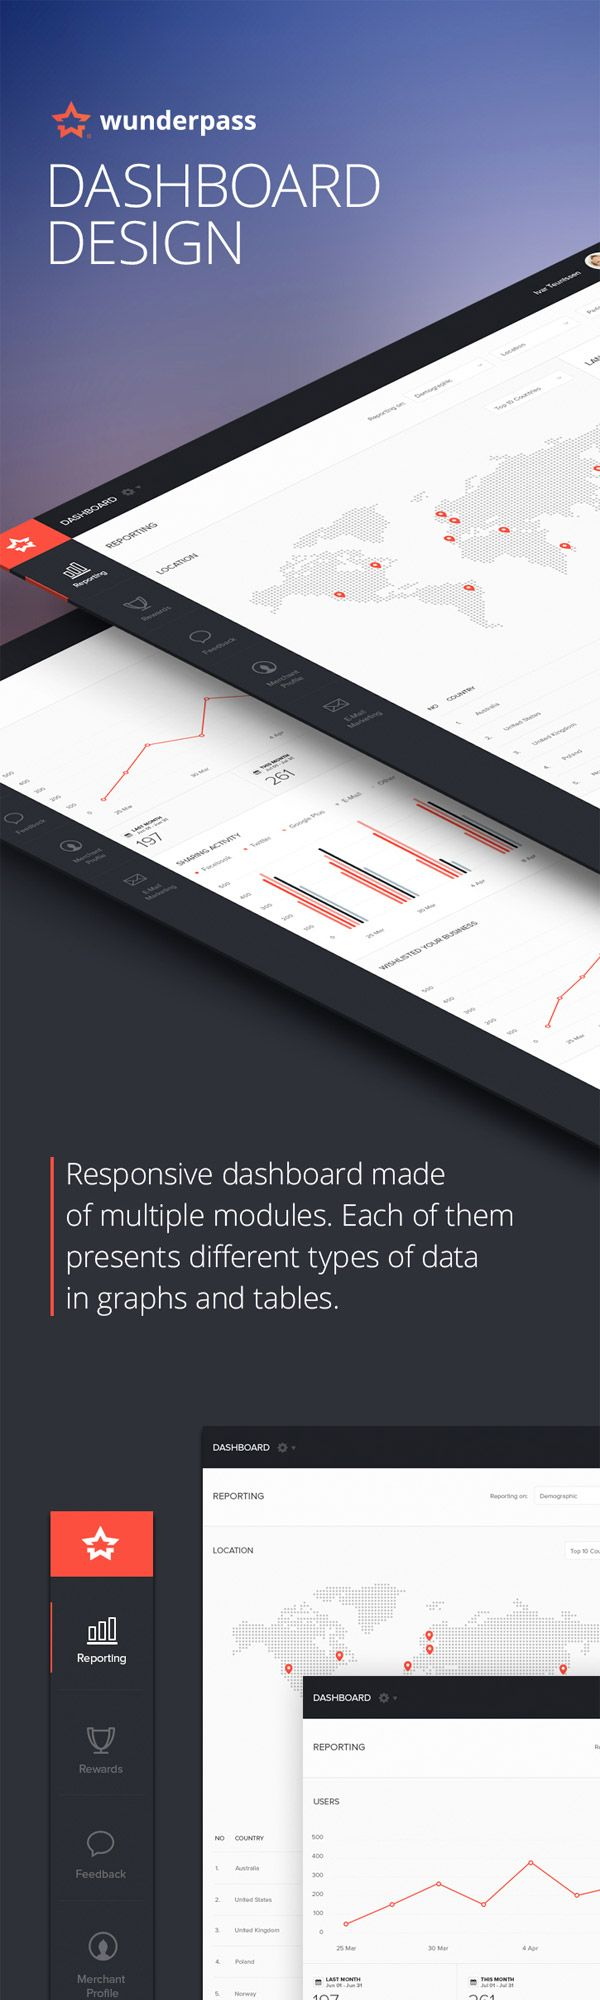 Inspirational Showcase of UI/UX Design Presentations